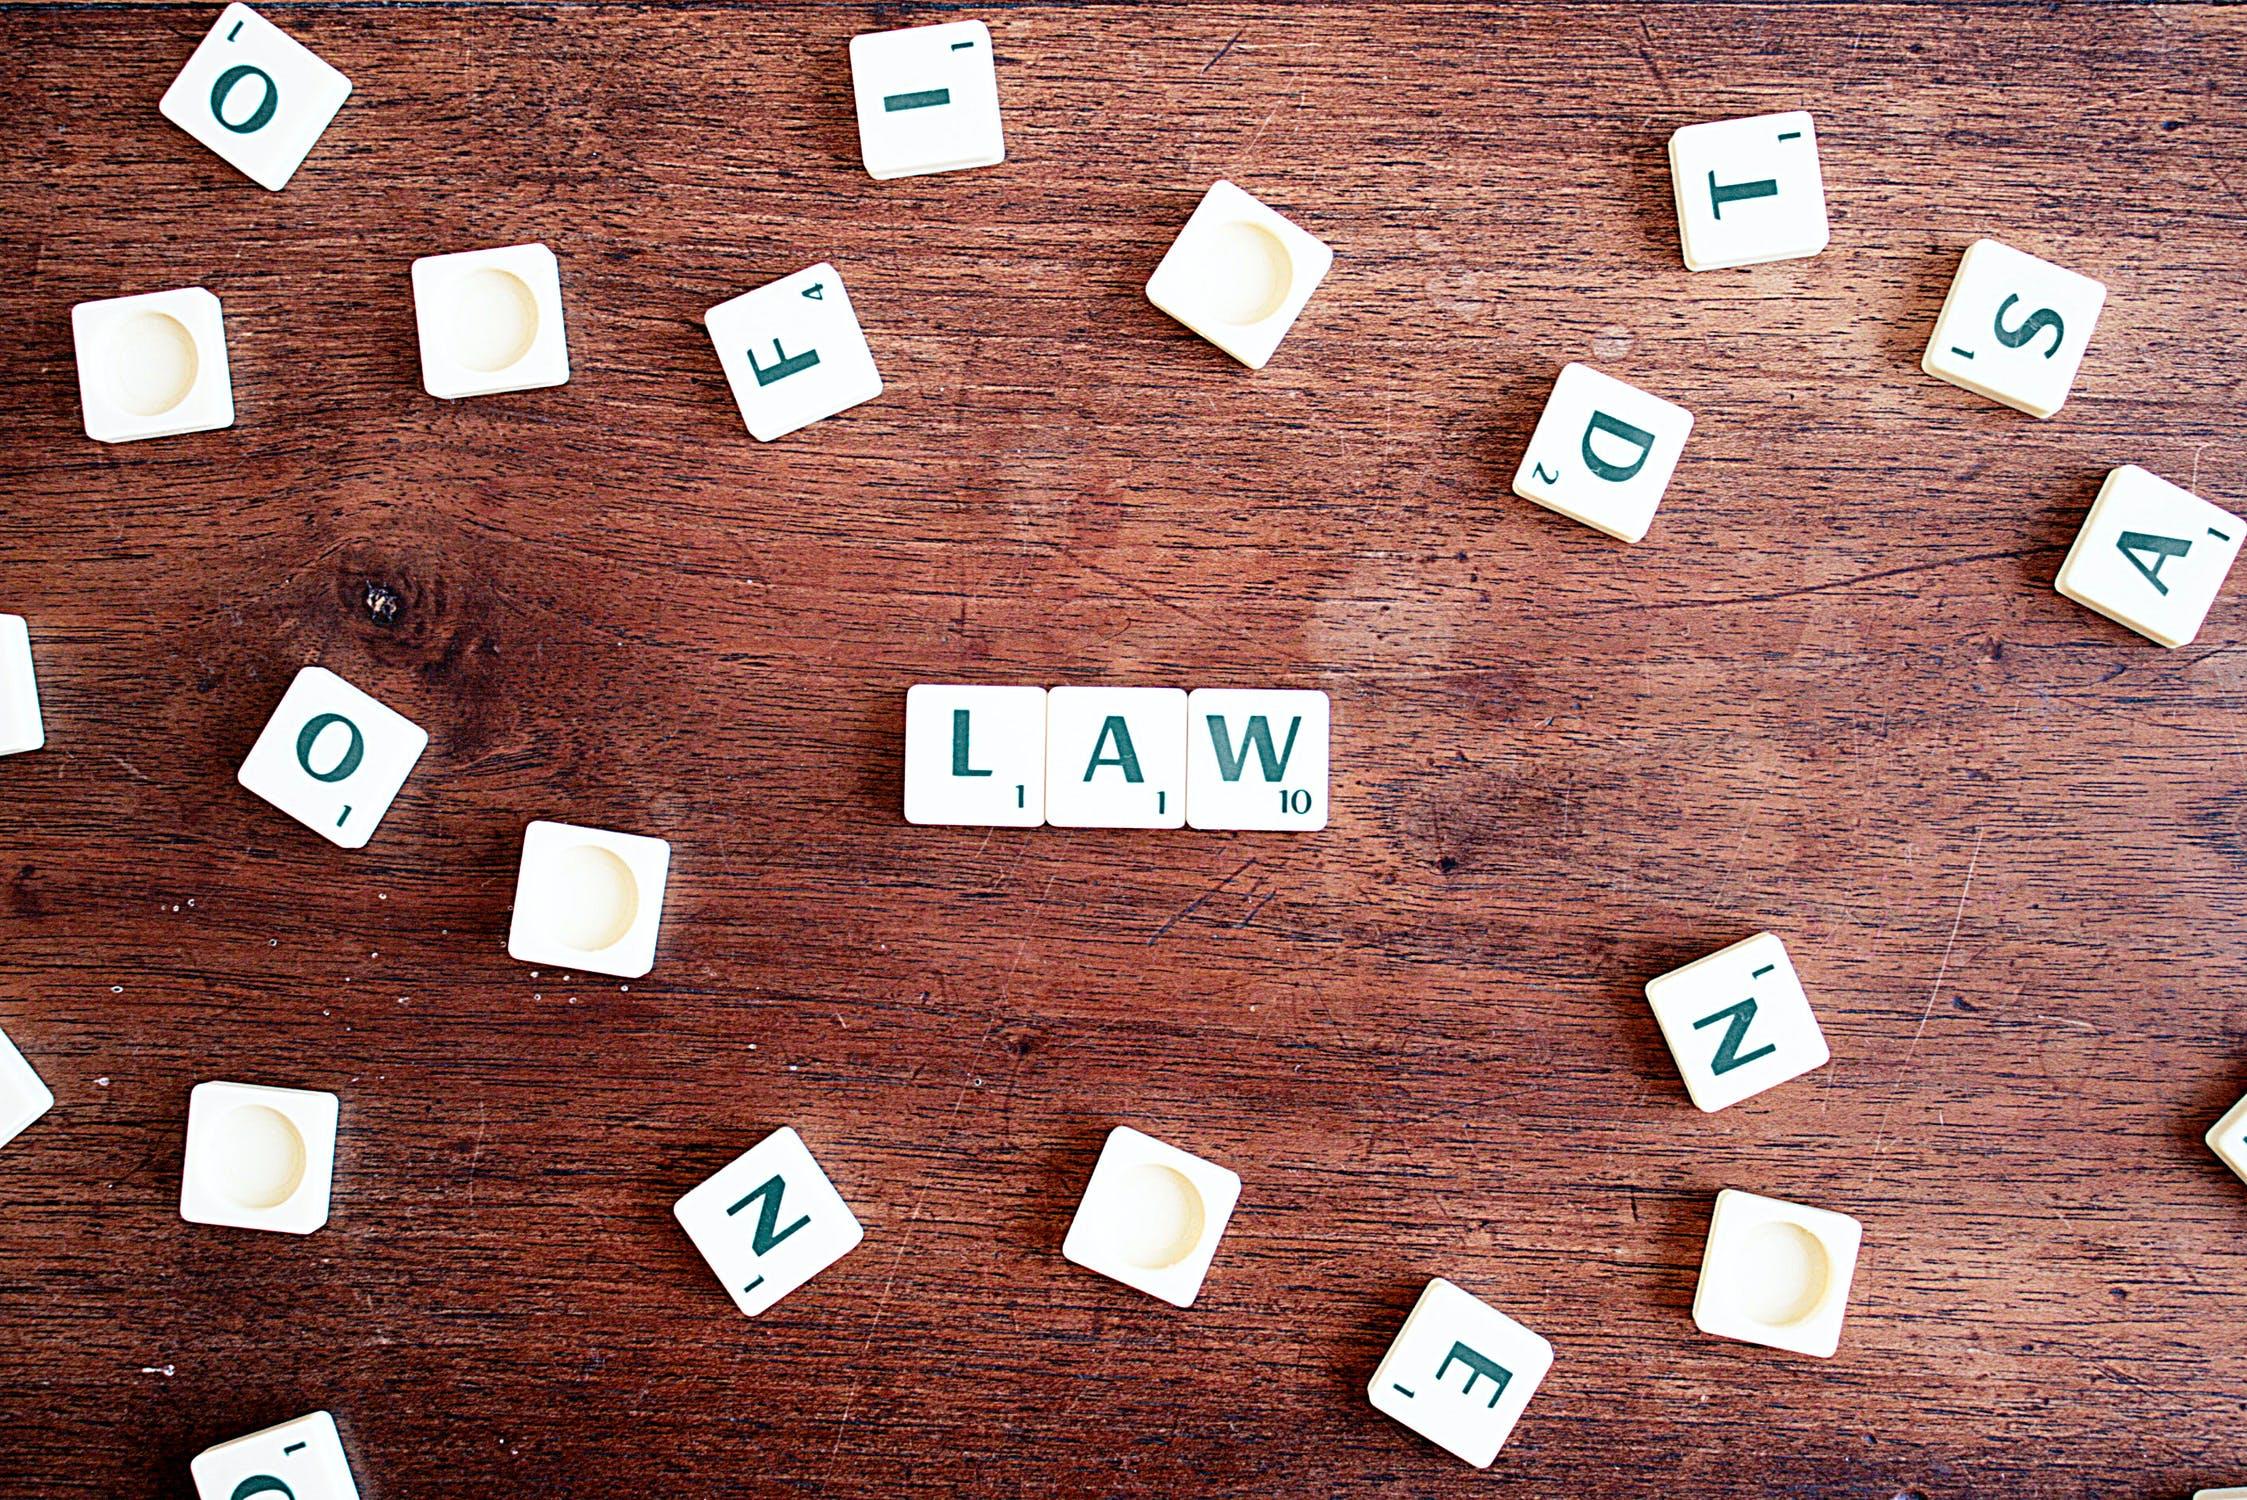 law scrabble tiles